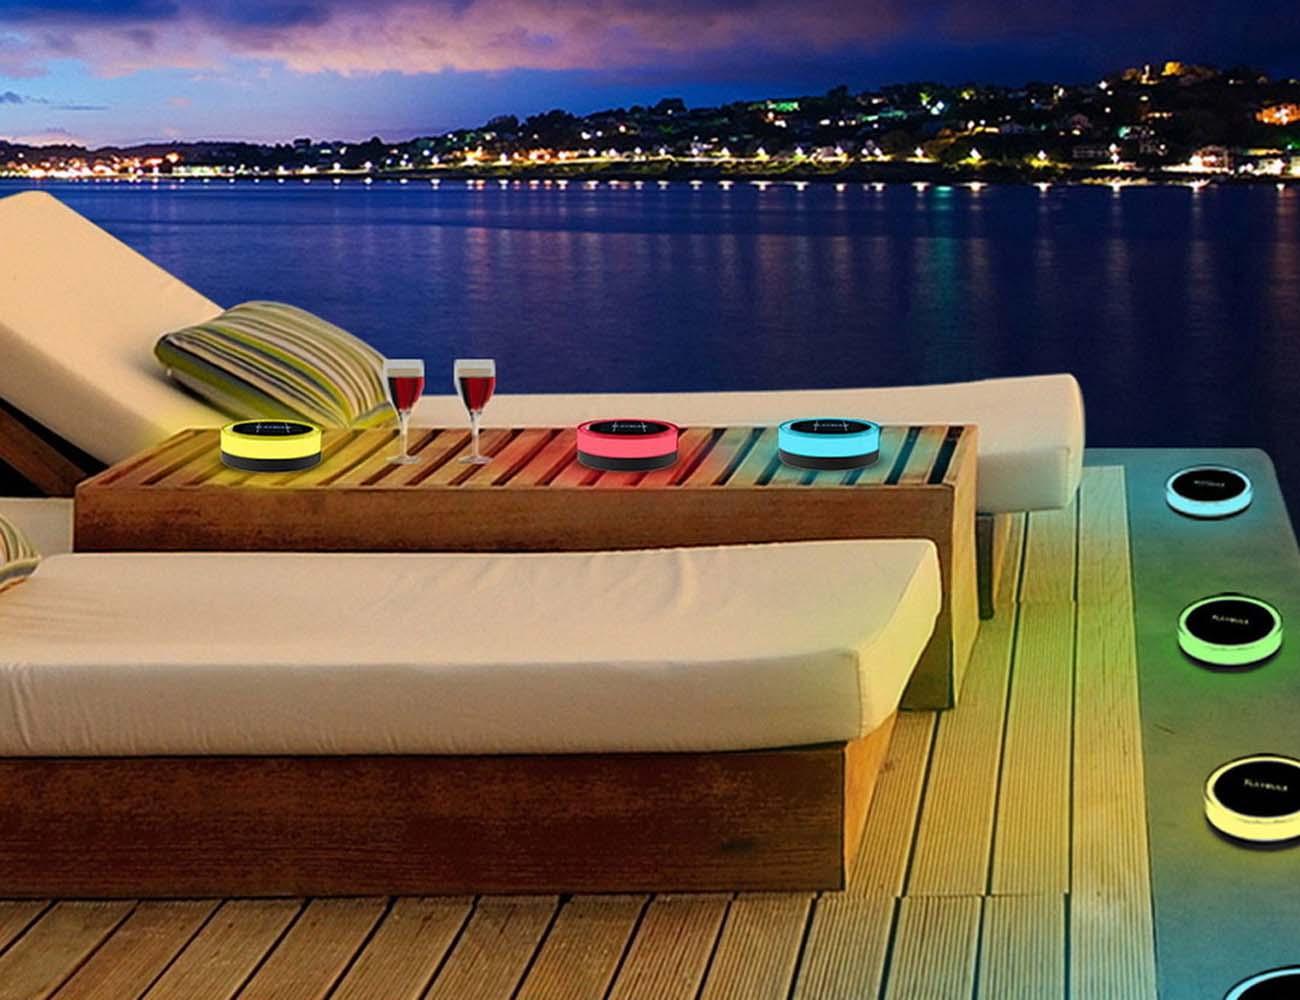 Playbulb – Garden Bluetooth Solar Light